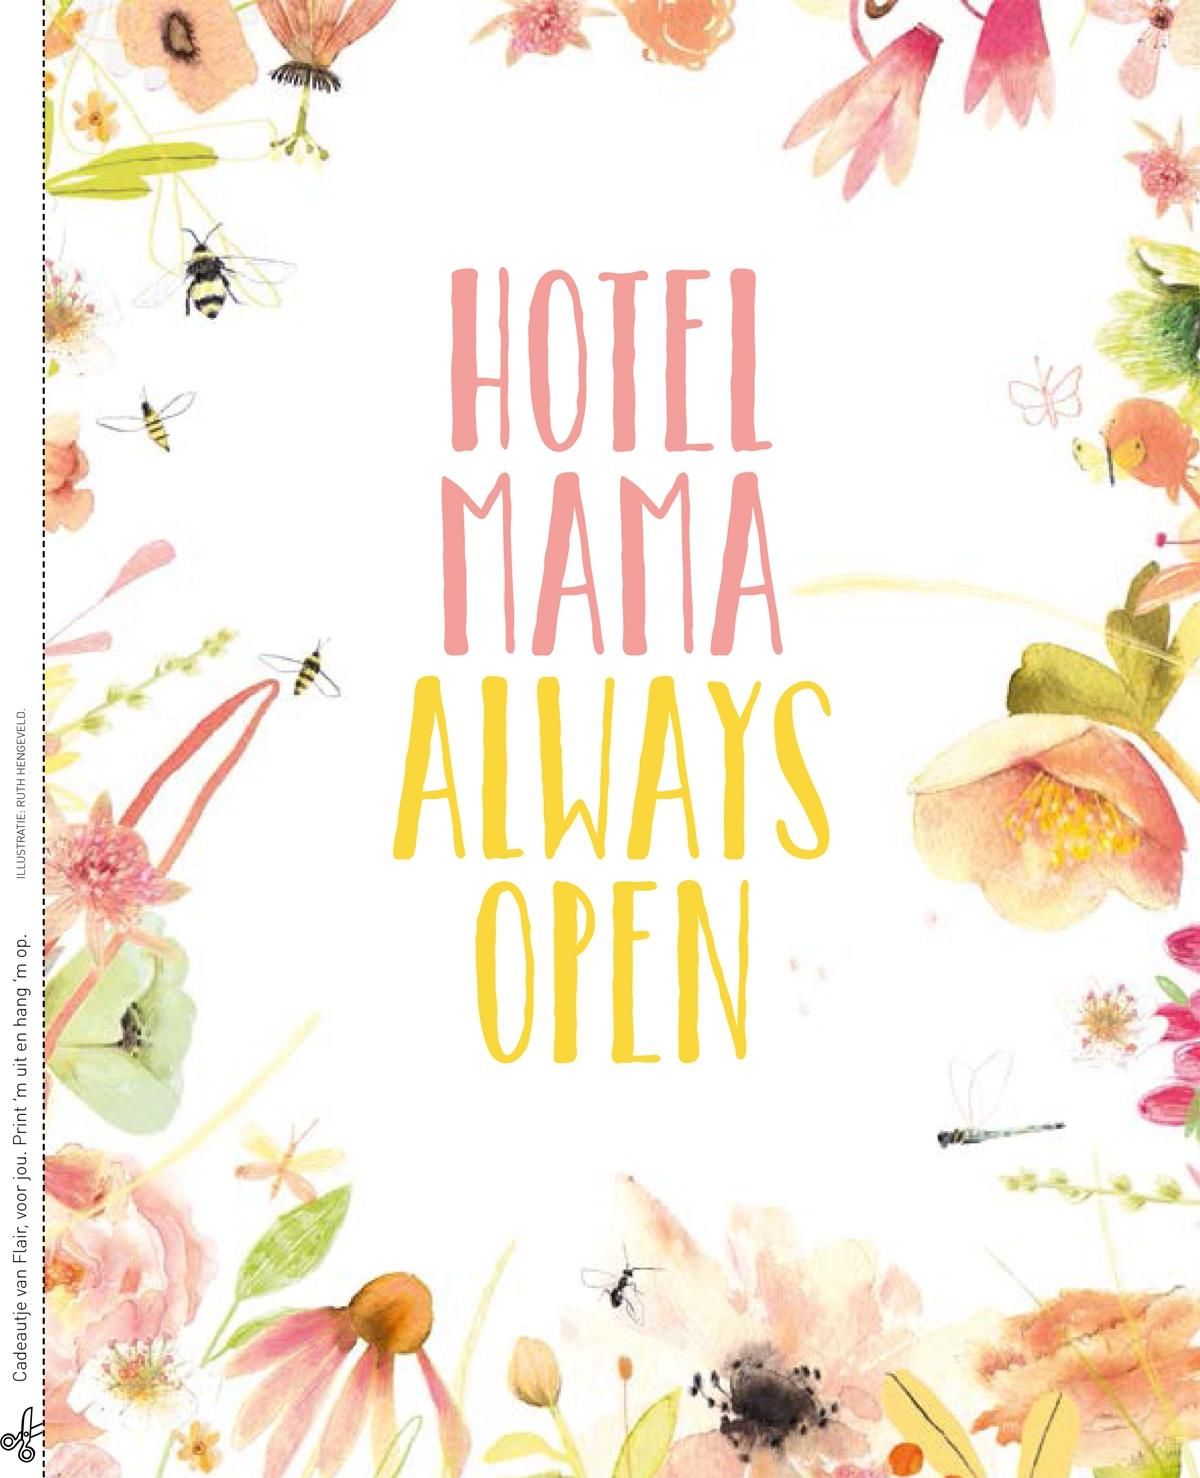 Spreuk: Hotel mama